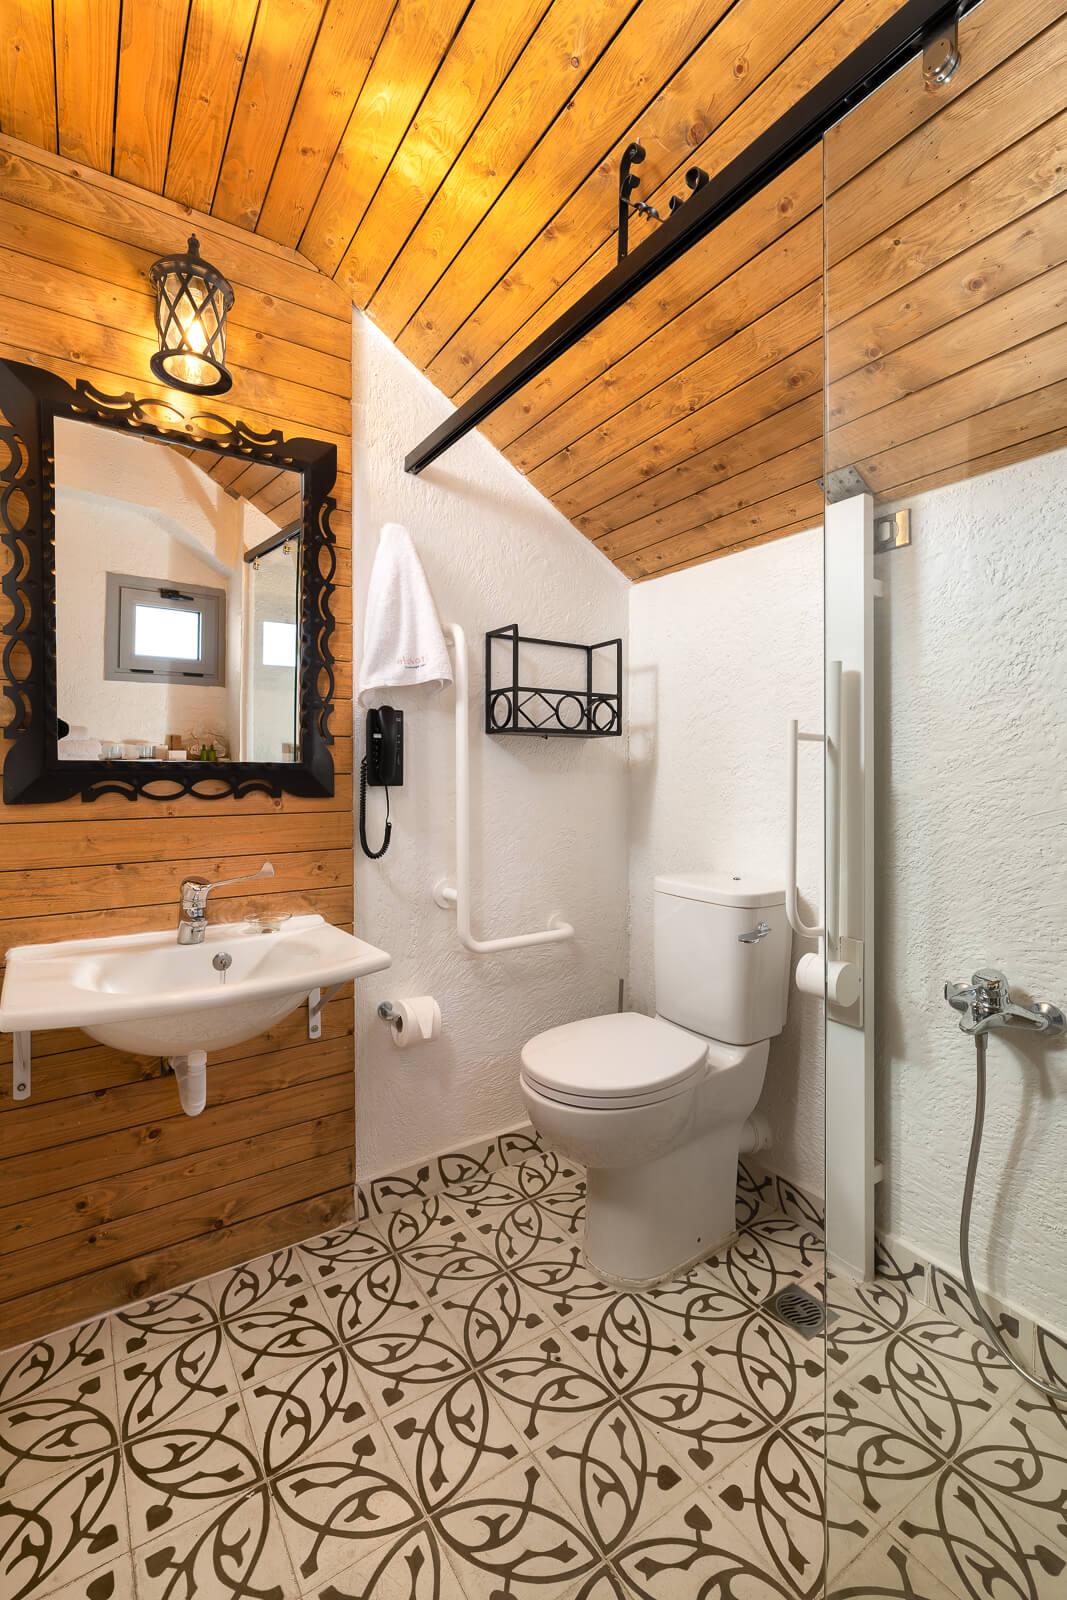 Elafos Hotel Bathroom - Elakati Best Hotel in Rhodes Greece